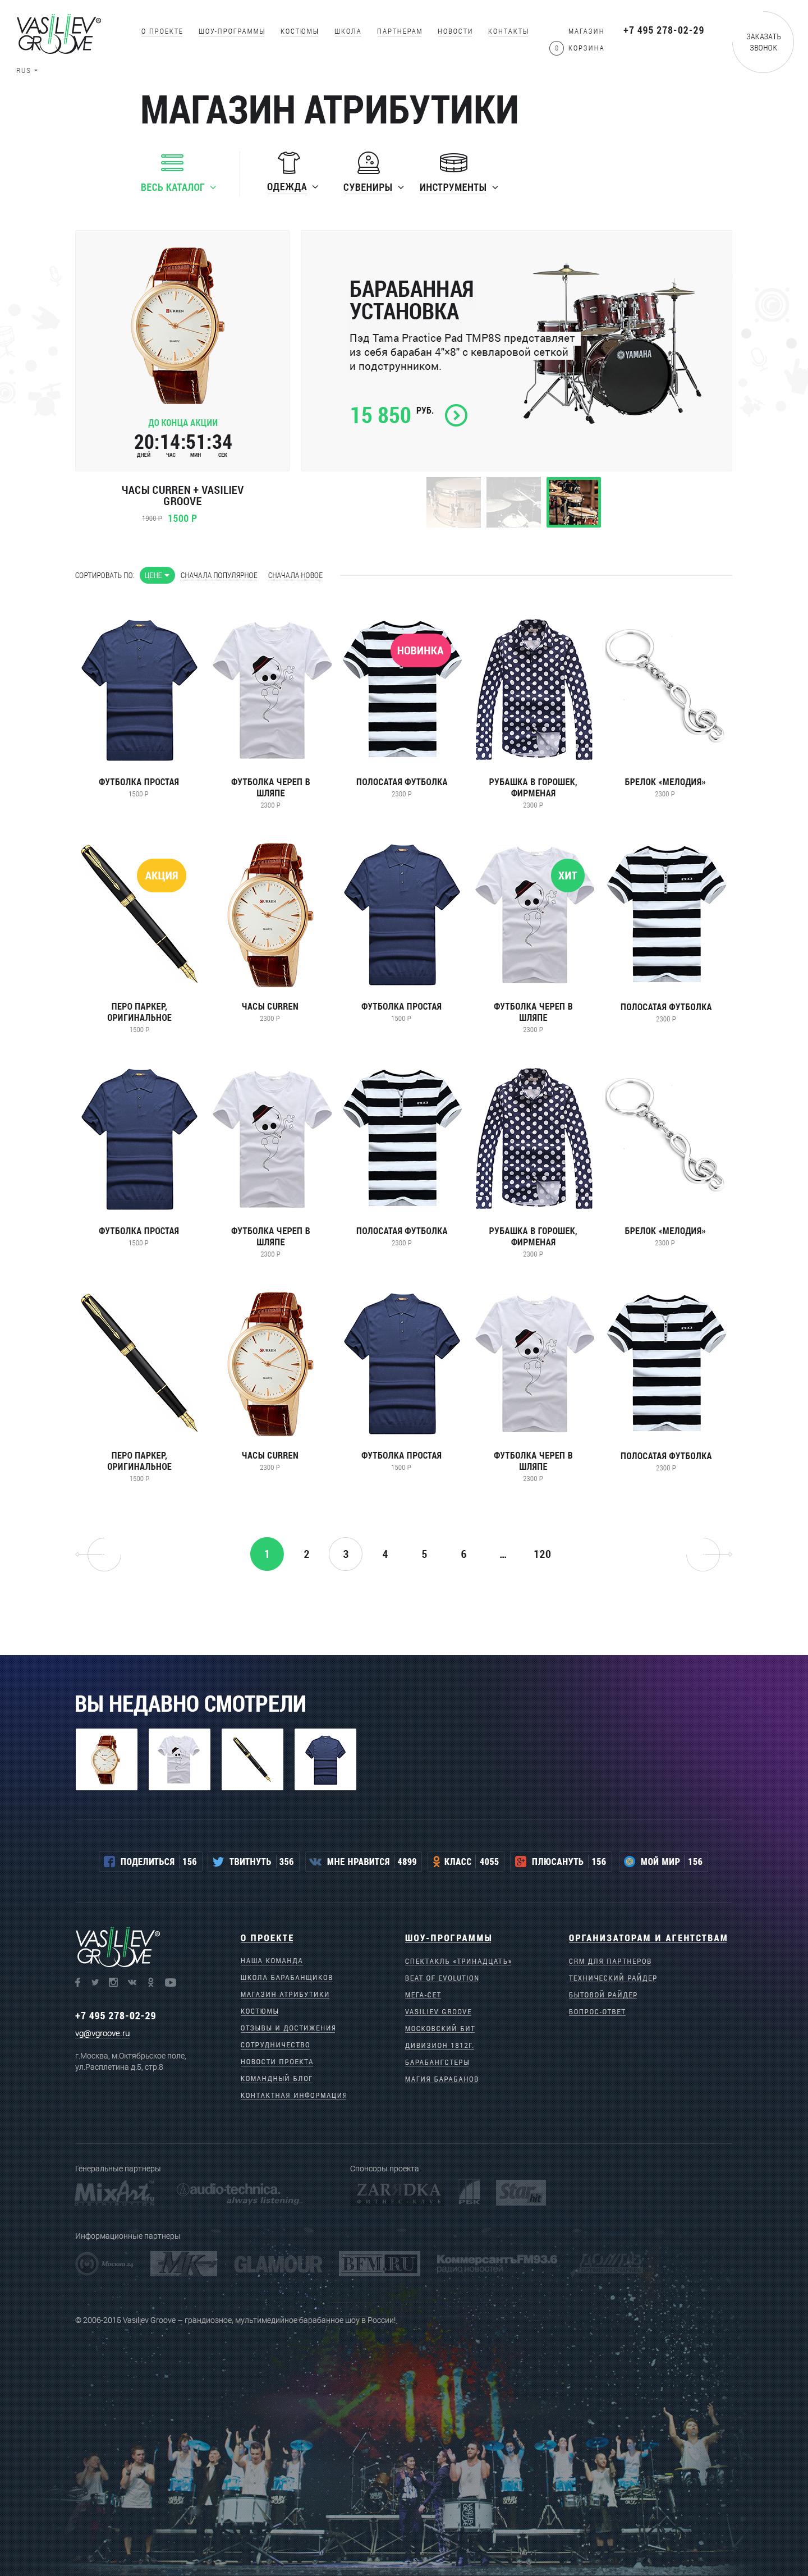 vgroove_catalog